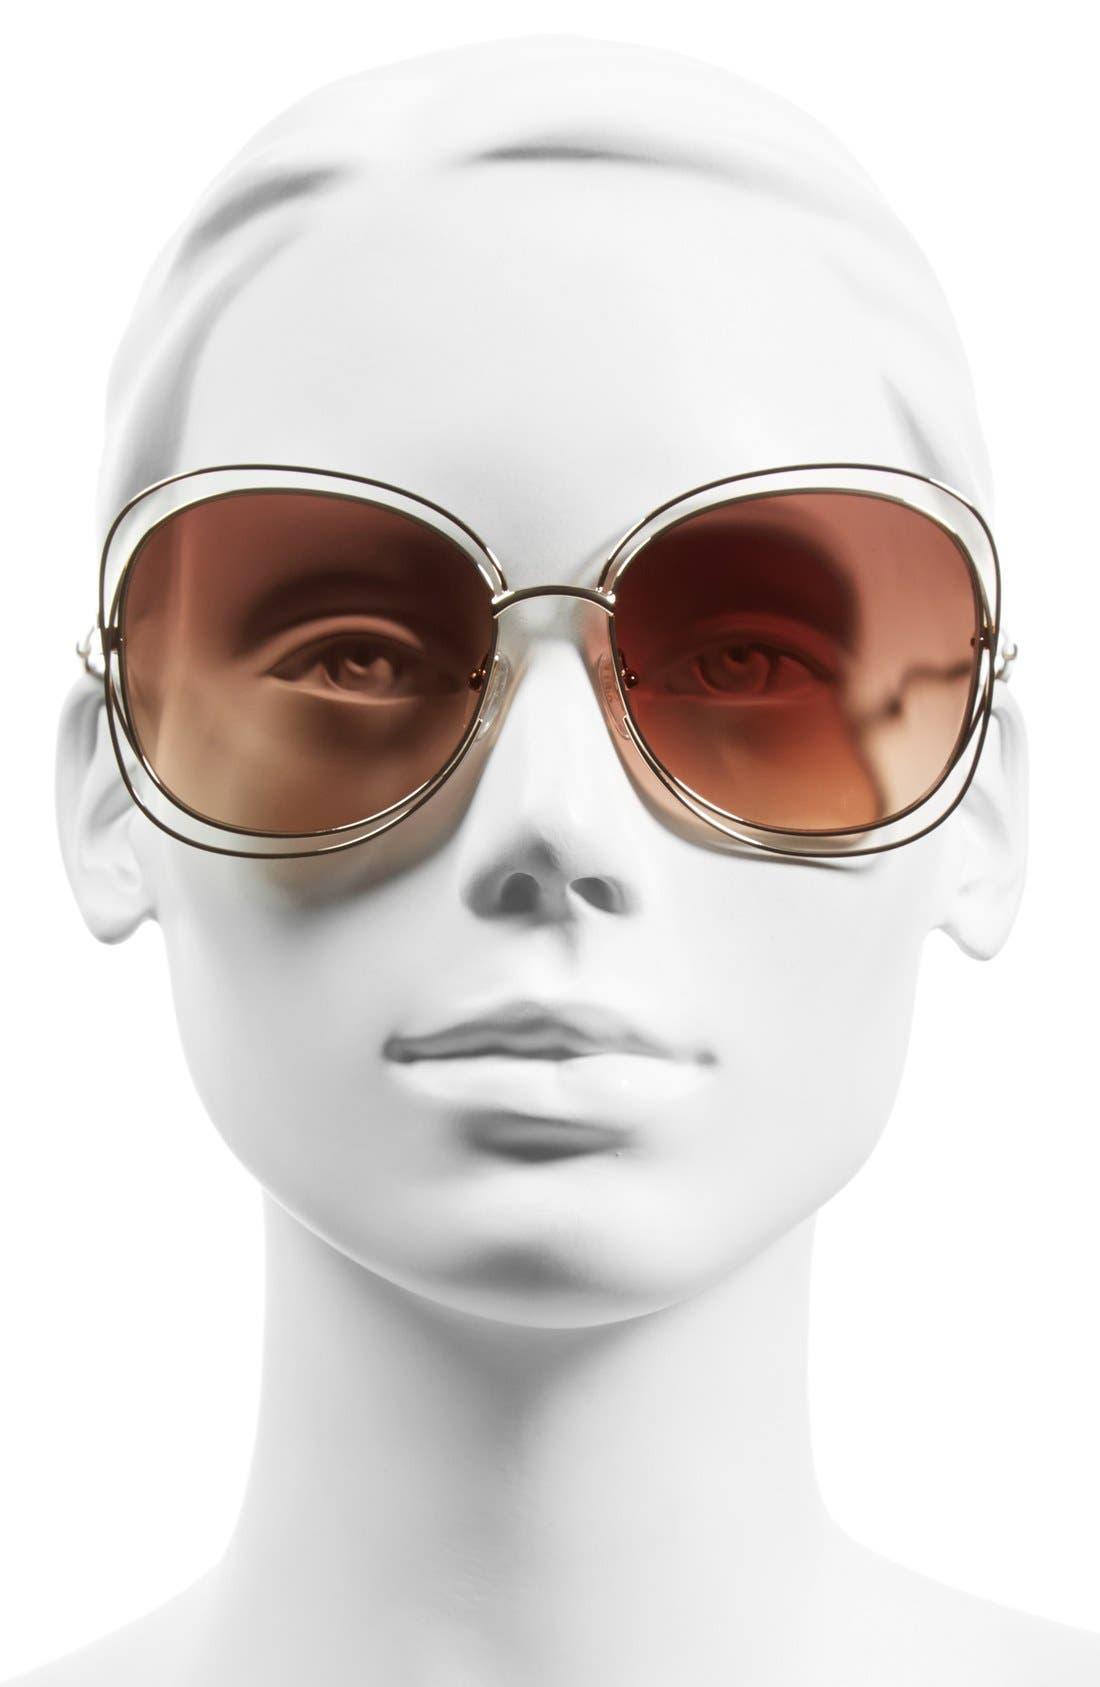 CHLOÉ, Carlina 60mm Gradient Les Sunglasses, Alternate thumbnail 2, color, ROSE GOLD/ BROWN